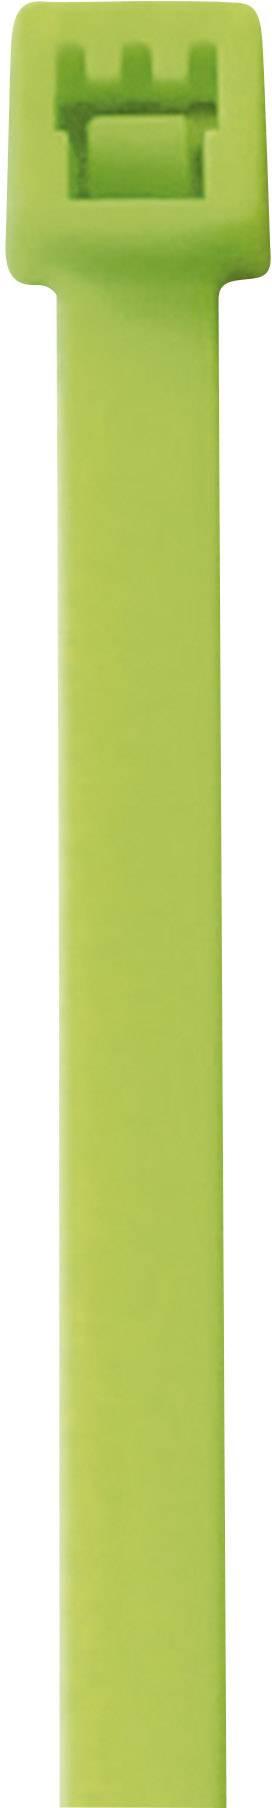 Neonska kabelska vezica, fluorescenčna (D x Š) 192 mm x 4.6 mm zelena, 50 kosov, PB Fastener